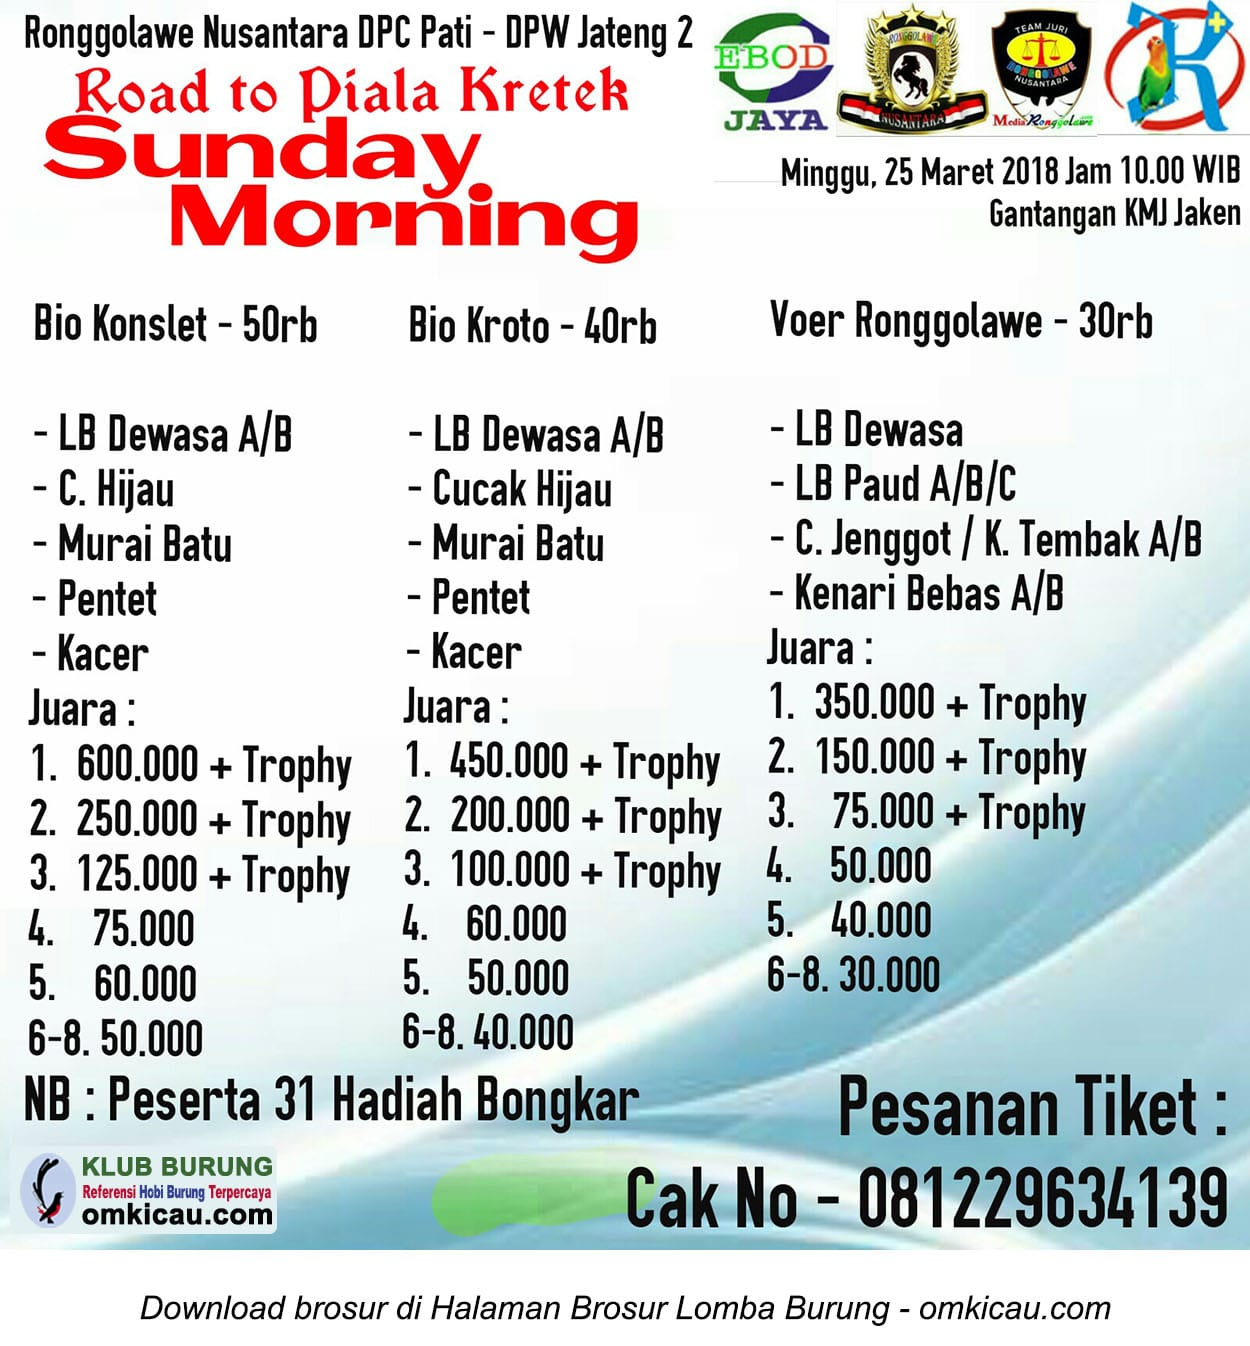 Road to Piala Kretek